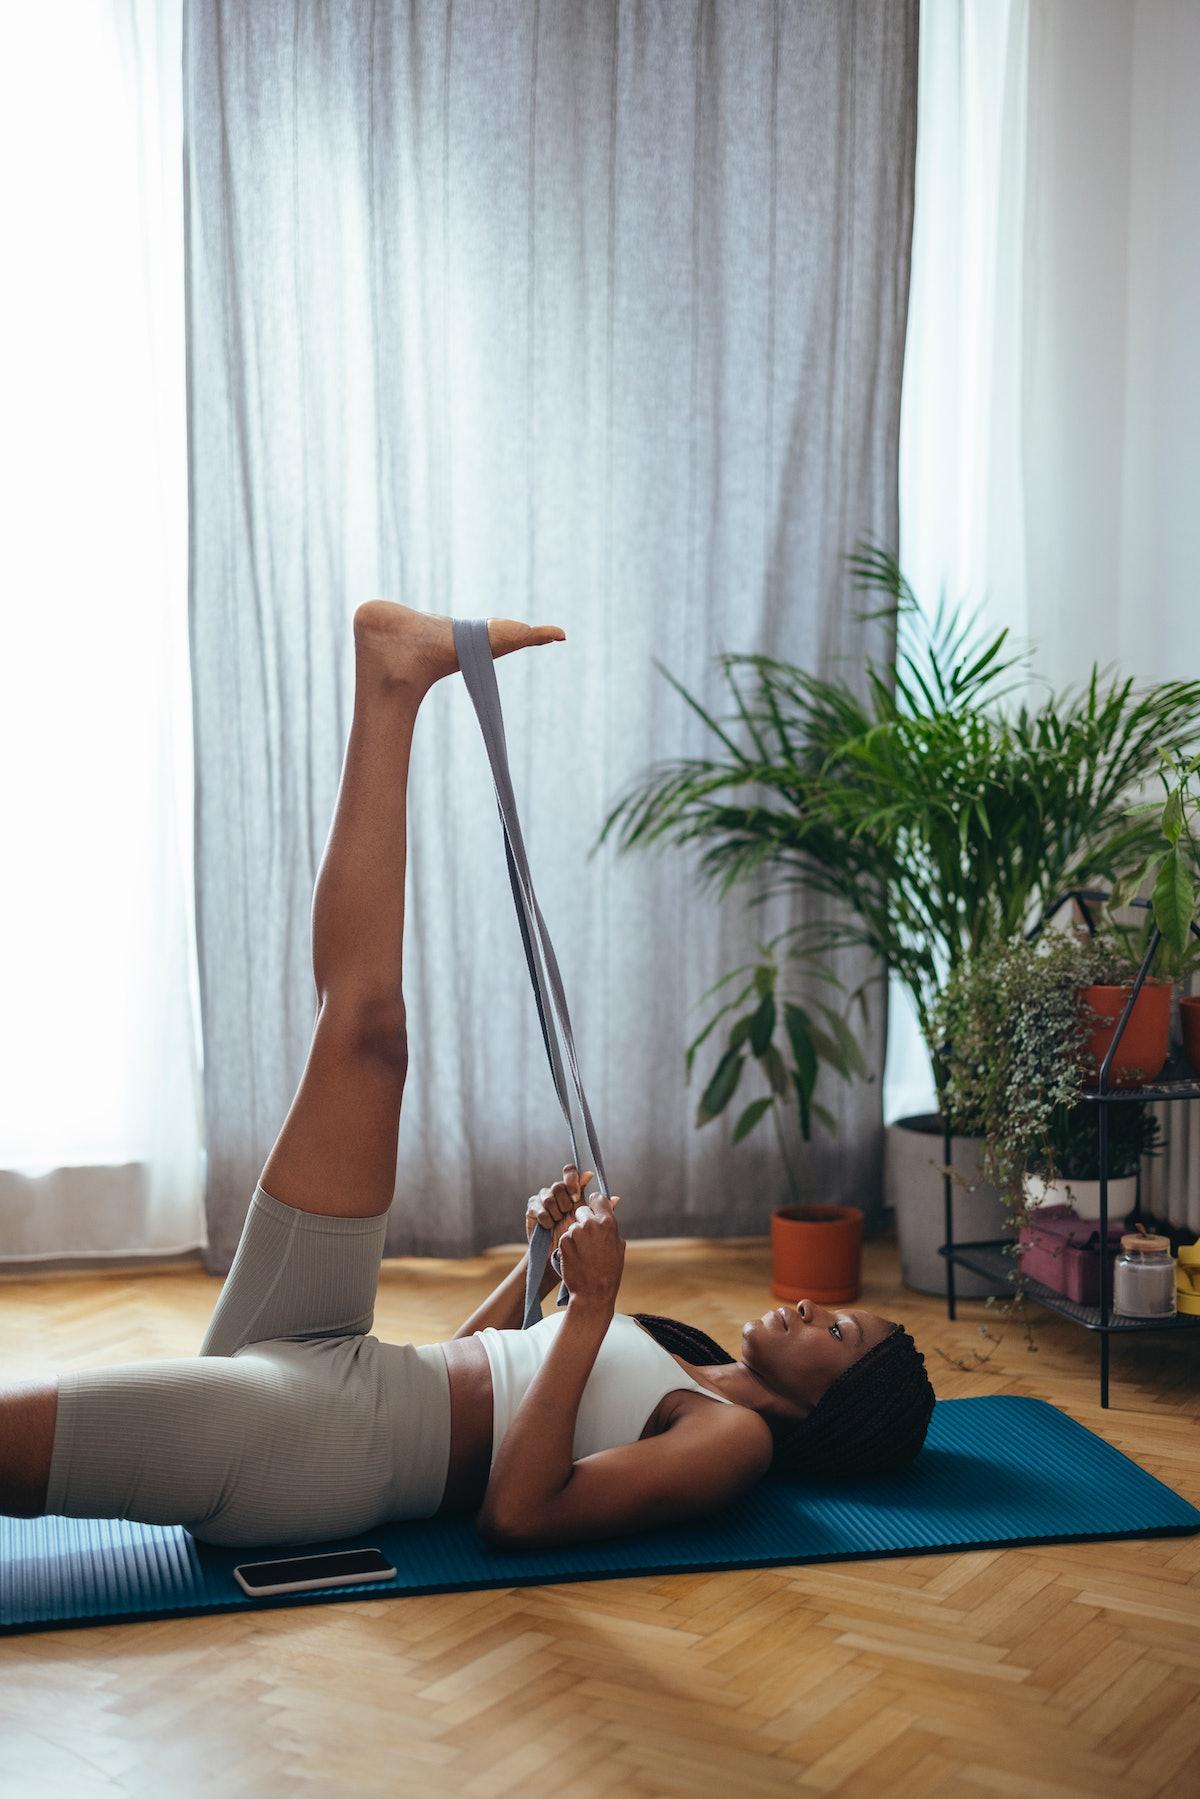 Resistance bands offer plenty of beginner-level exercise moves.